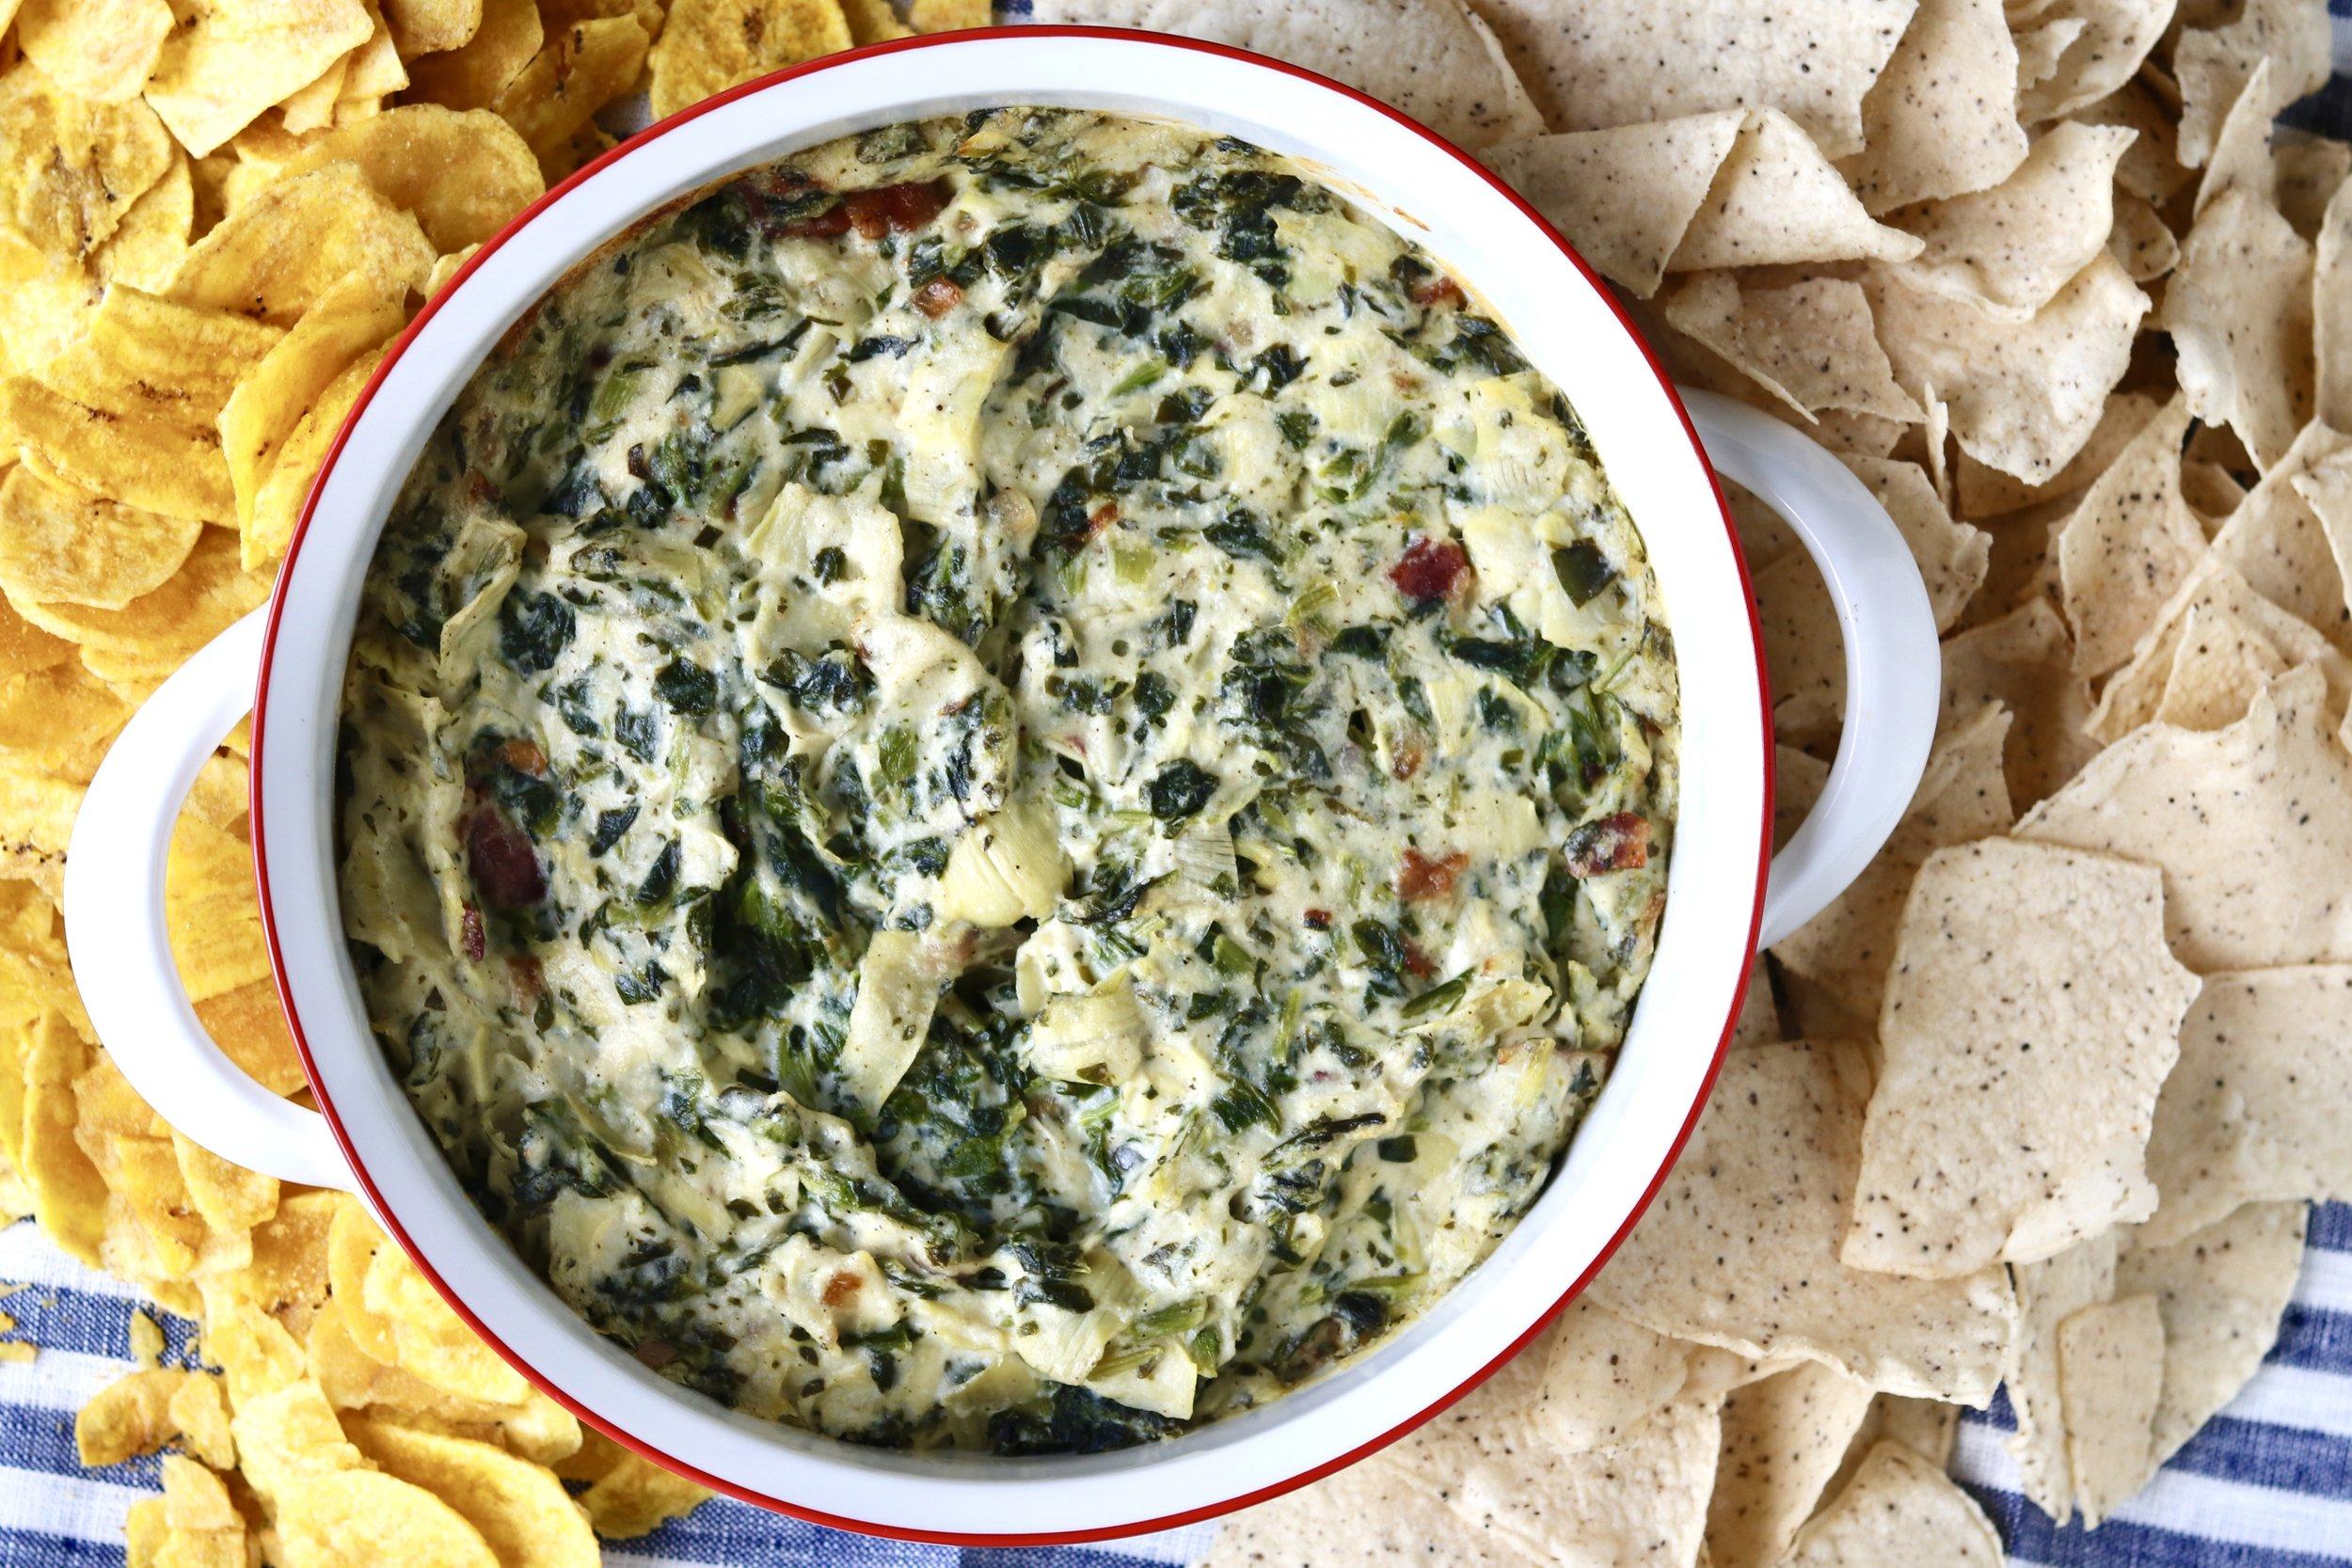 Creamy Spinach Artichoke Dip I'd Eat That Food